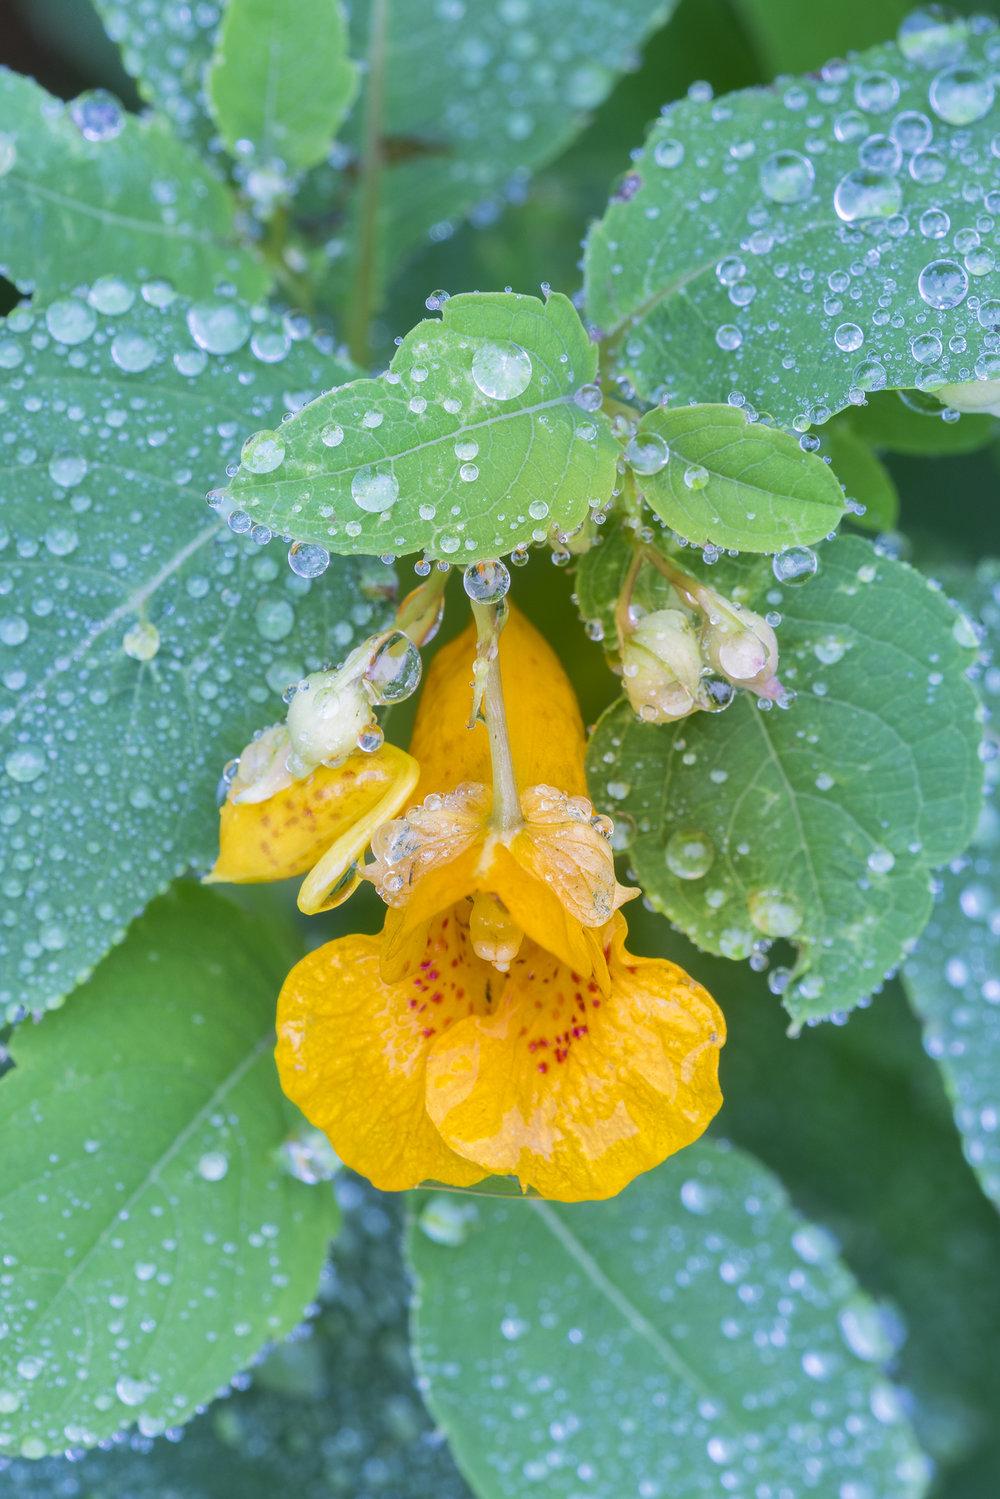 Raindrops on jewelweed